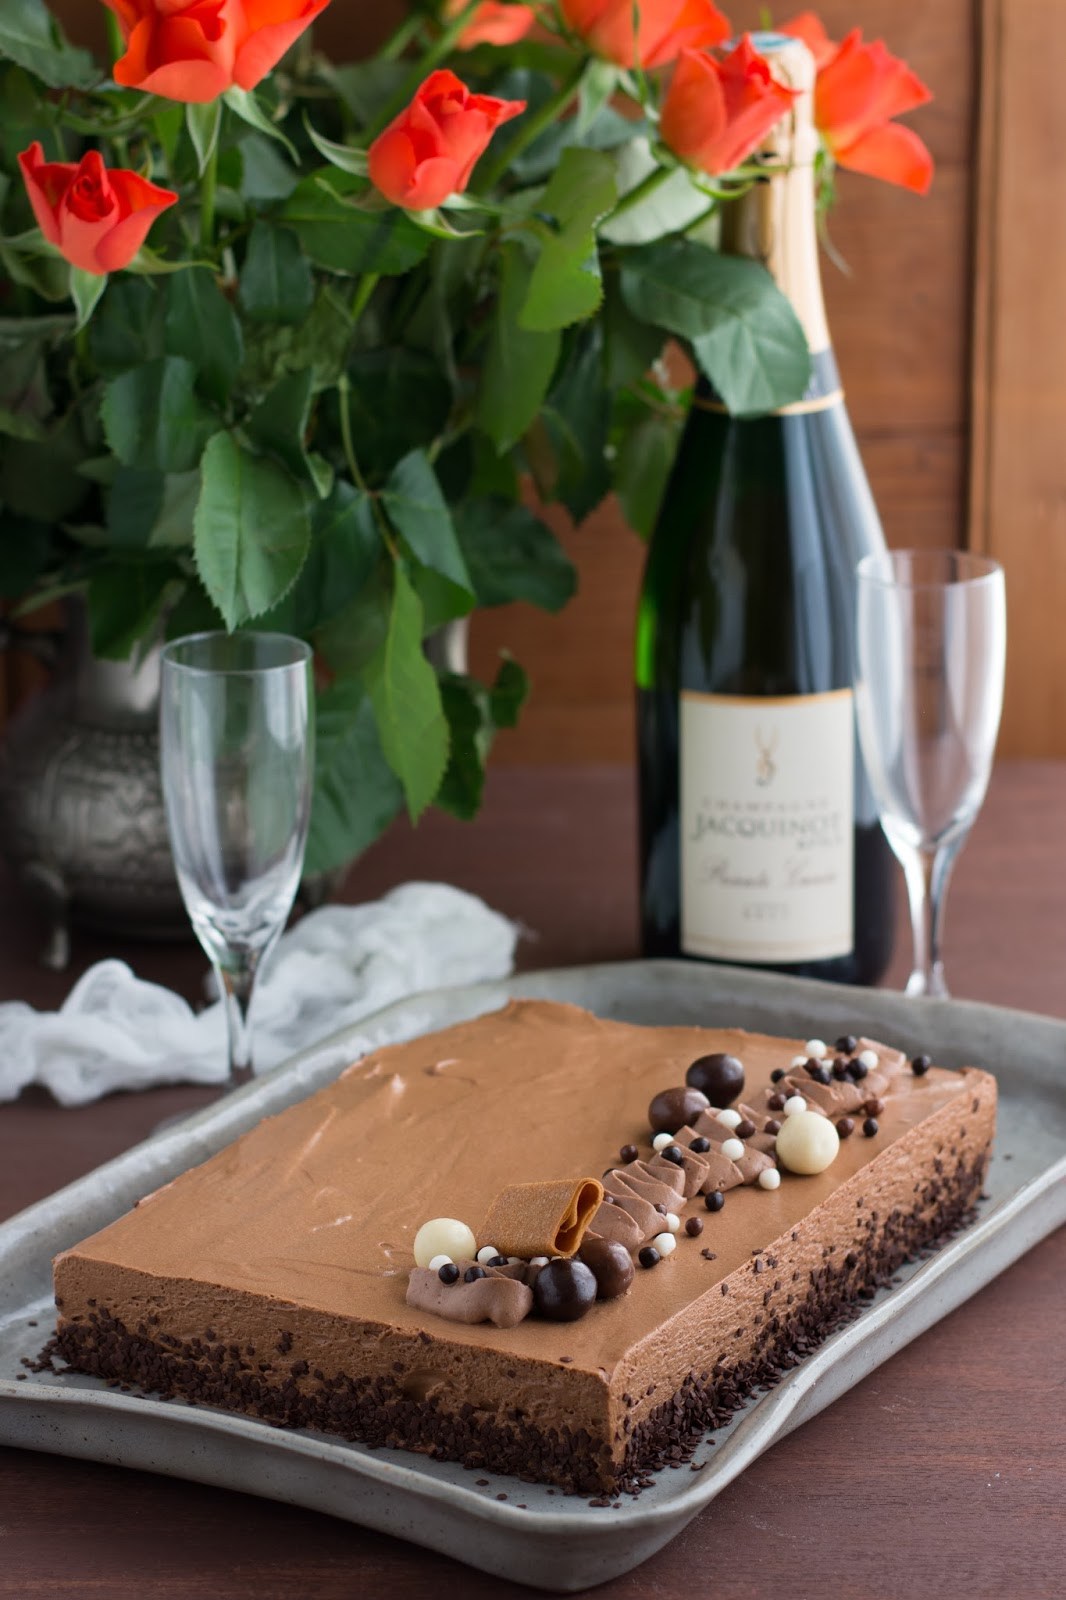 chic chic chocolat royal chocolat nouvelle recette. Black Bedroom Furniture Sets. Home Design Ideas